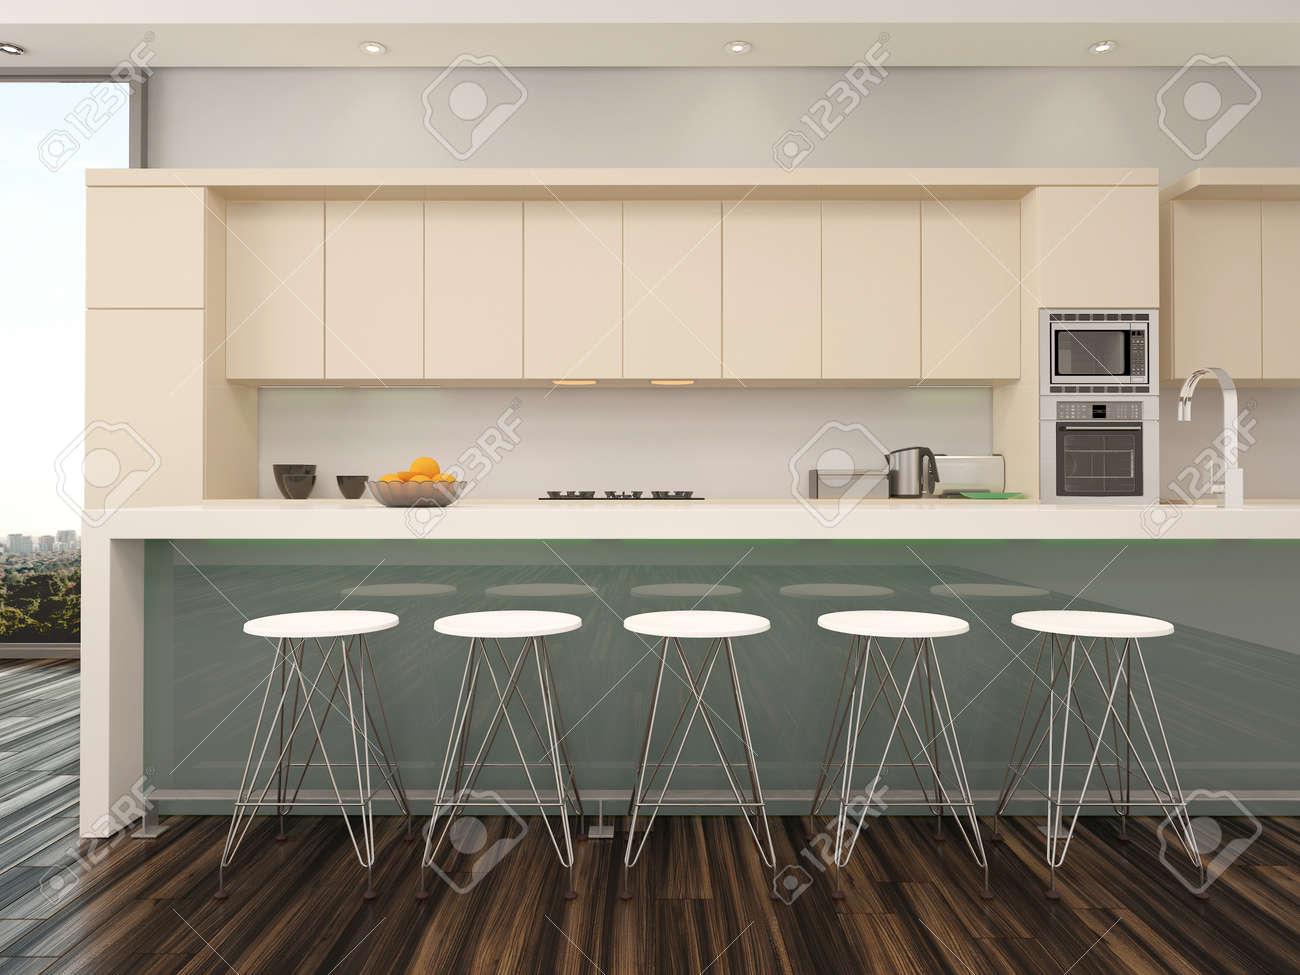 Stunning U Küchen Bilder Contemporary - Milbank.us - milbank.us